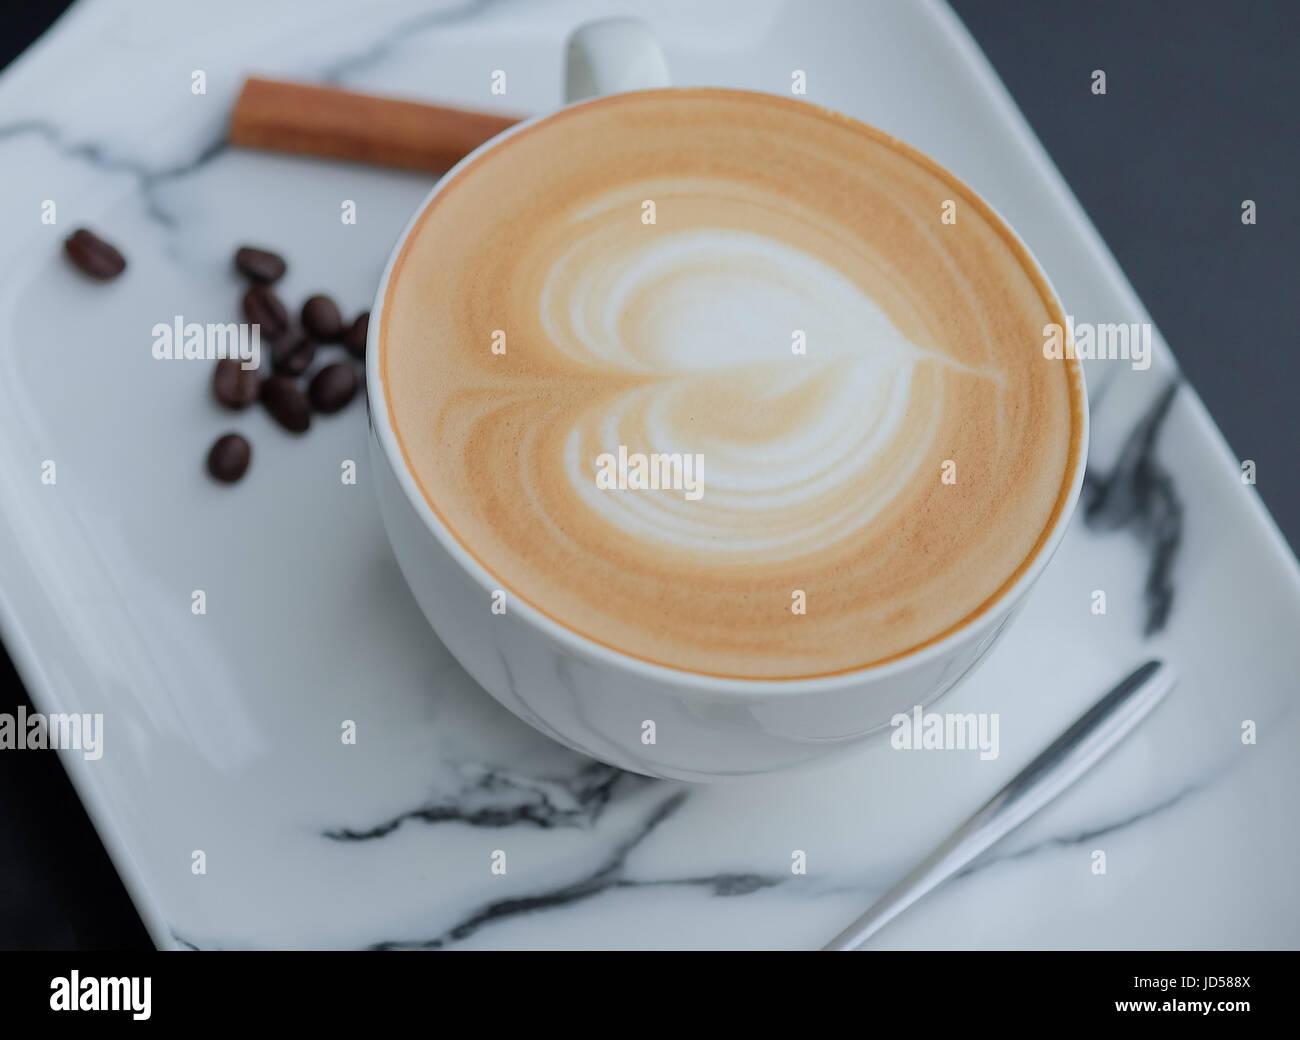 Latte art coffee. Heart shape latter art in white cup - Stock Image